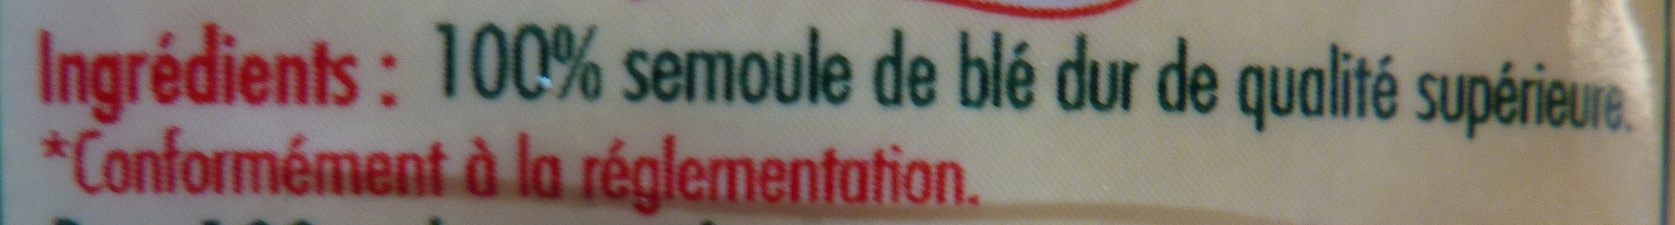 Pz semoule fine 500 v2 /6 - Ingredienti - fr